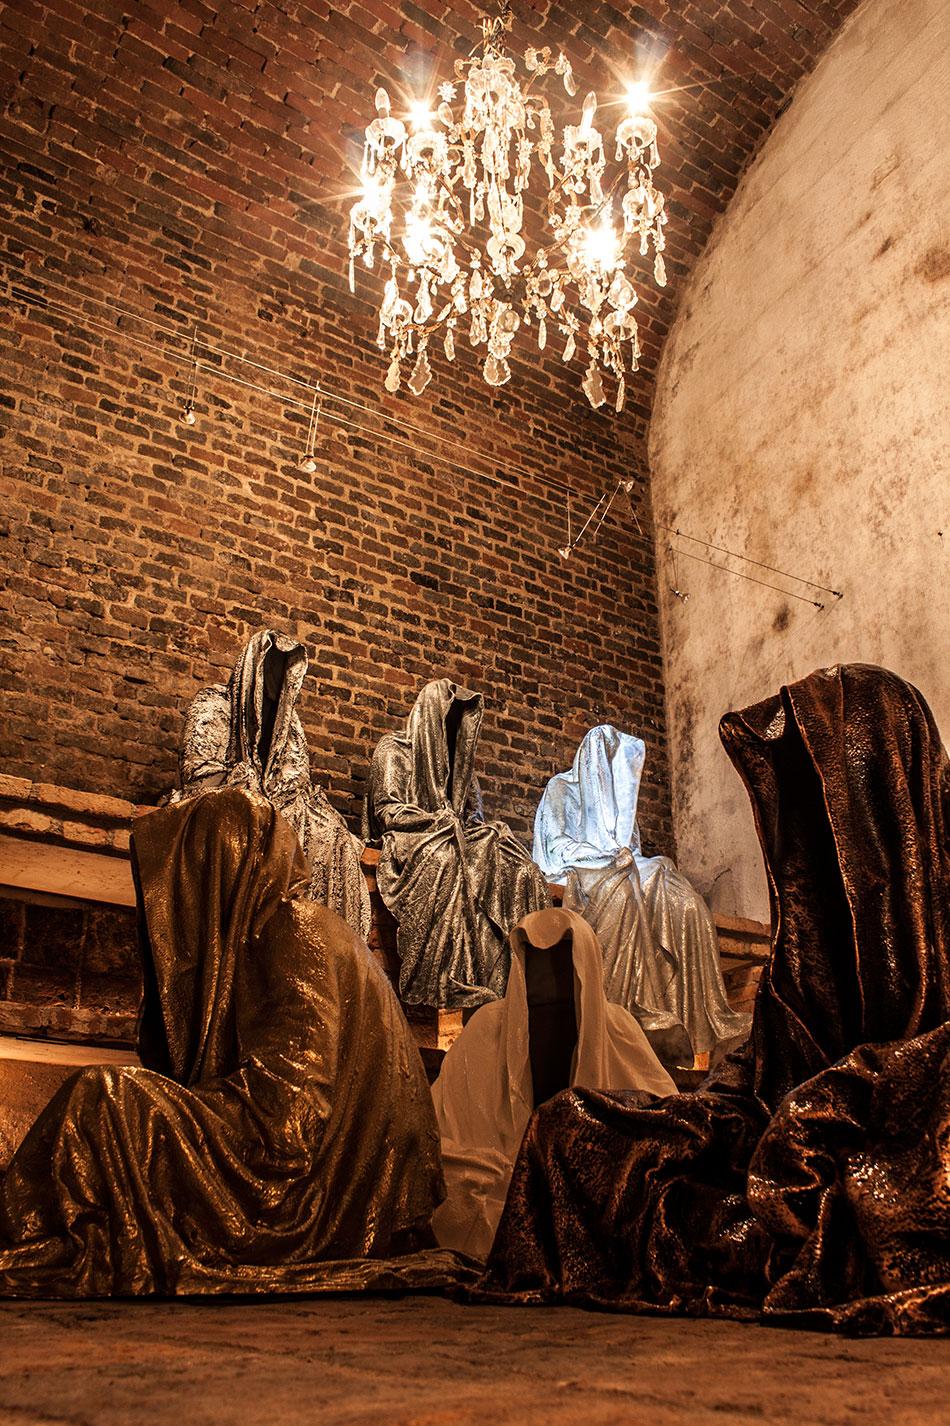 wine-cellar-galerie-artdealer--freller-guardians-of-time-manfred-kili-kielnhofer-contemporary-art-arts-light-design-sculpture-antique-show-statue-7909